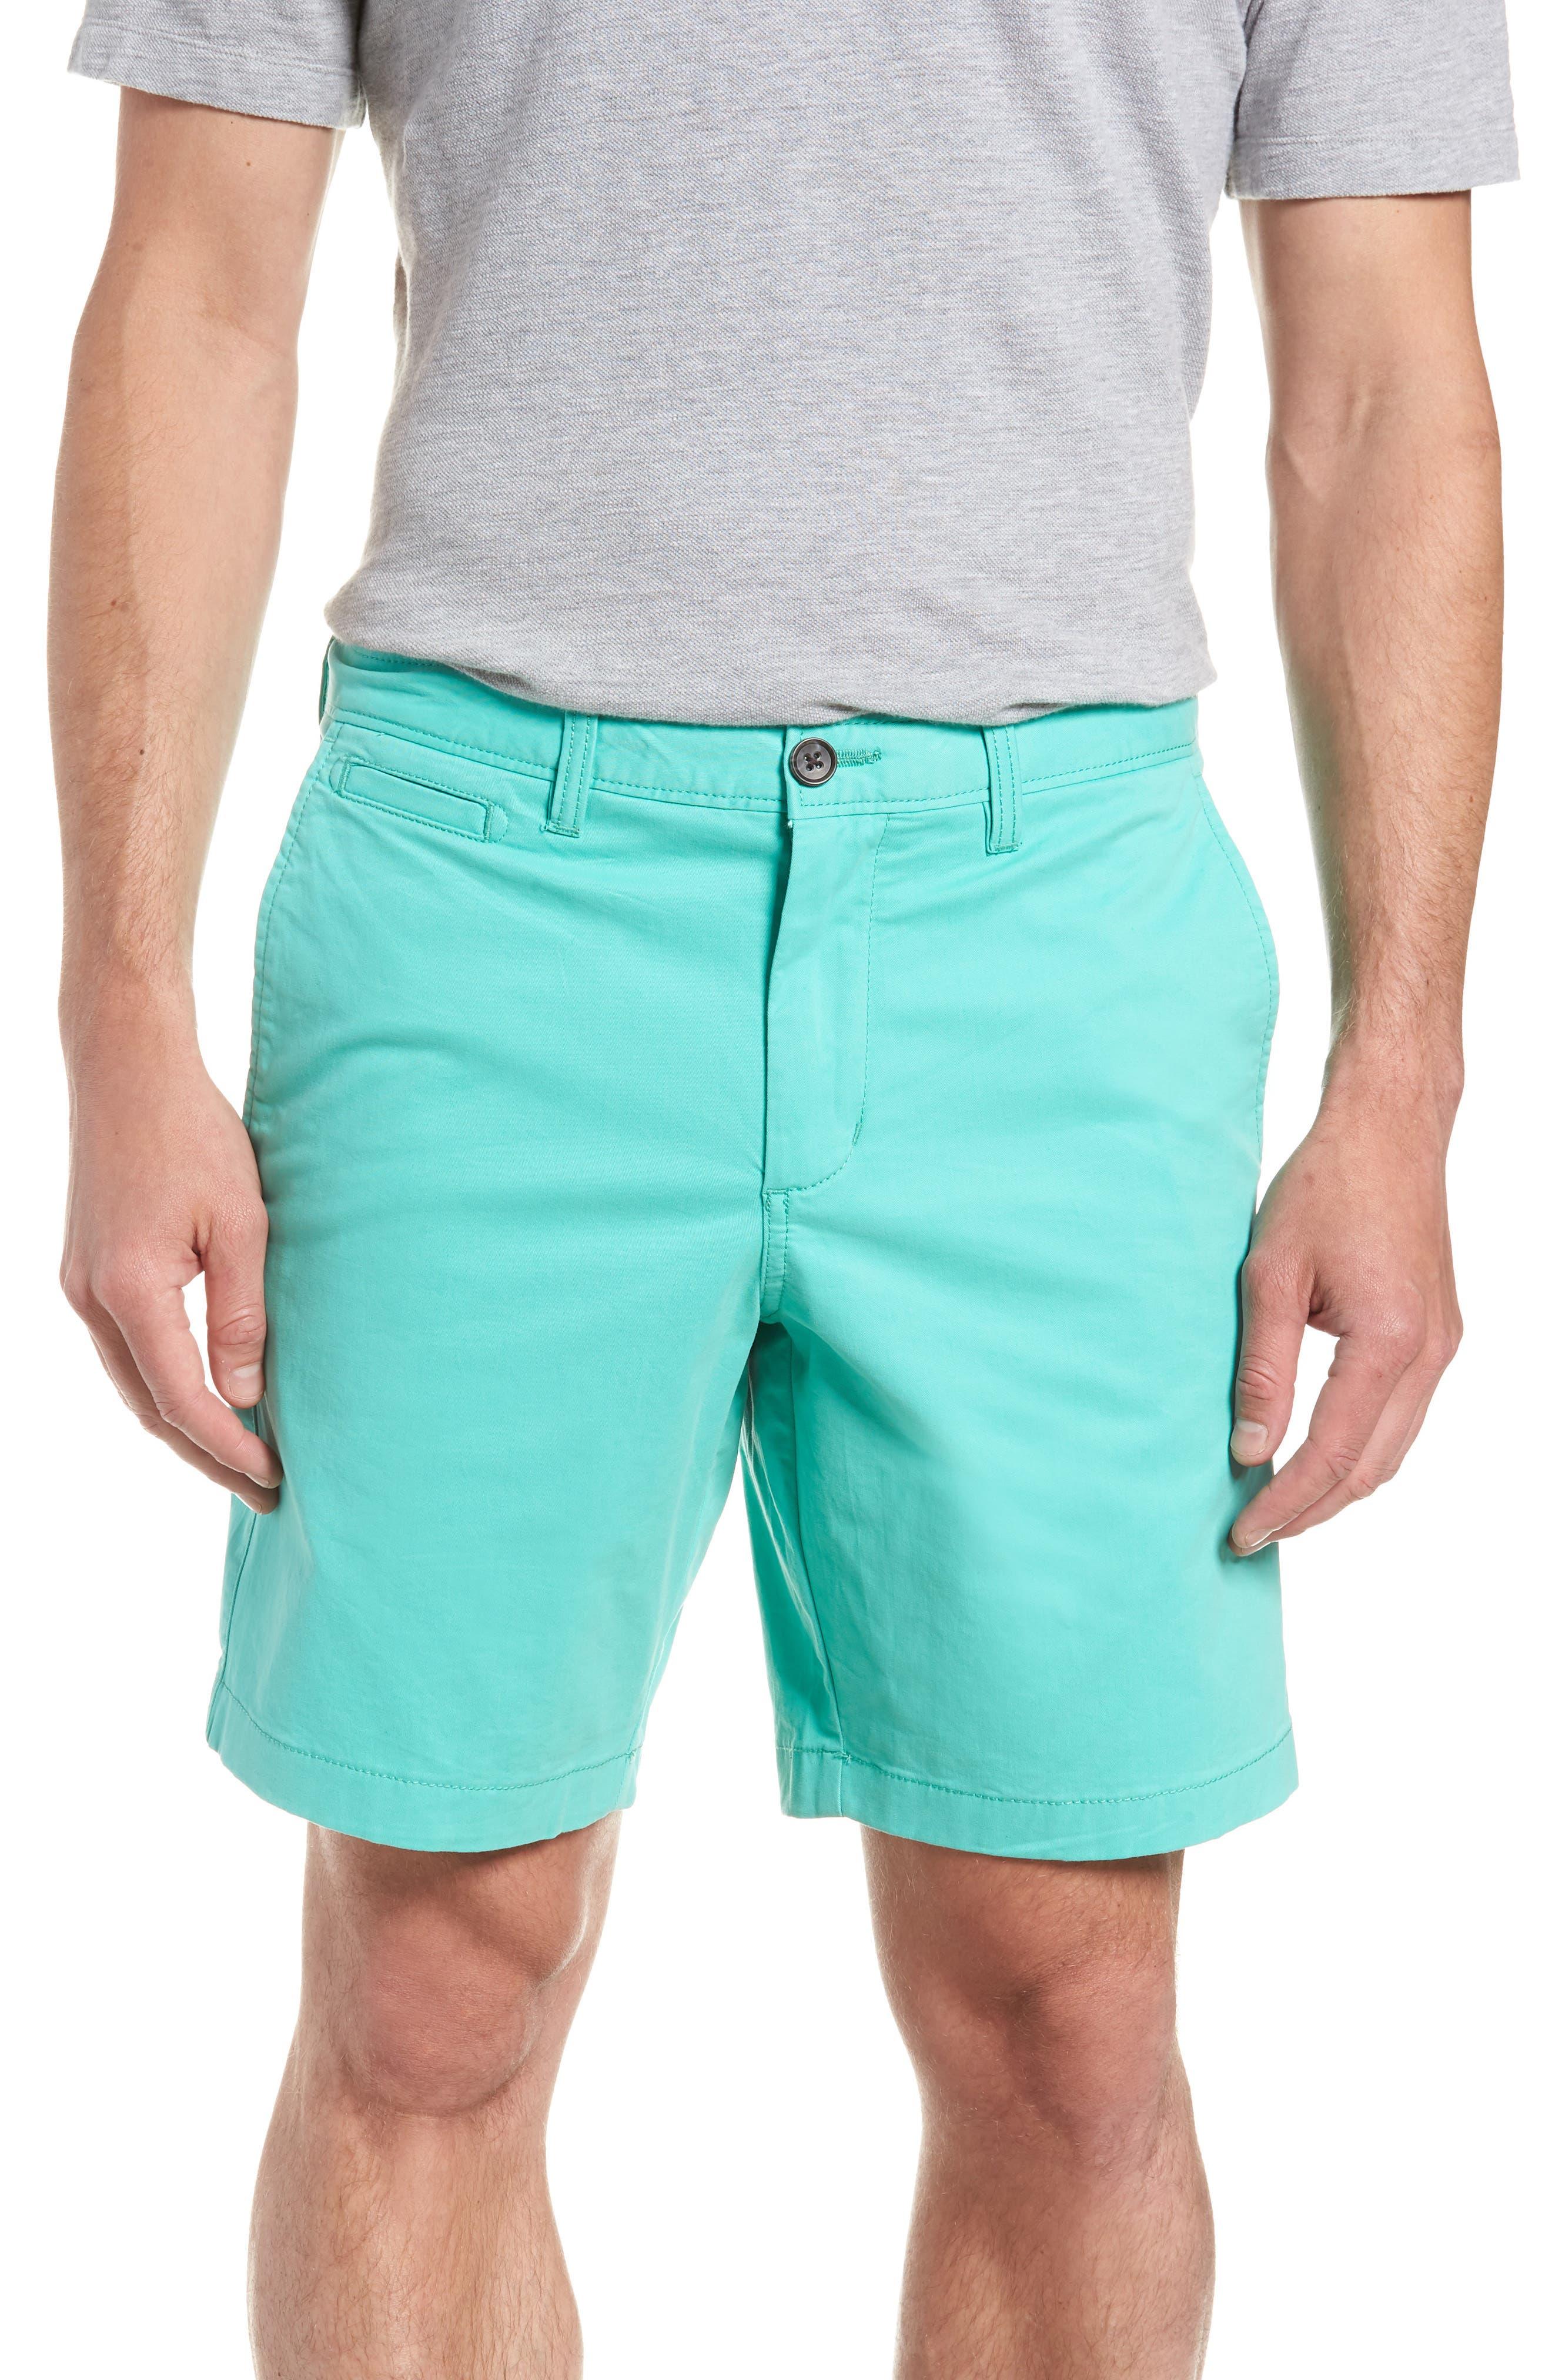 Ballard Slim Fit Stretch Chino 9-Inch Shorts,                         Main,                         color, Green Largo